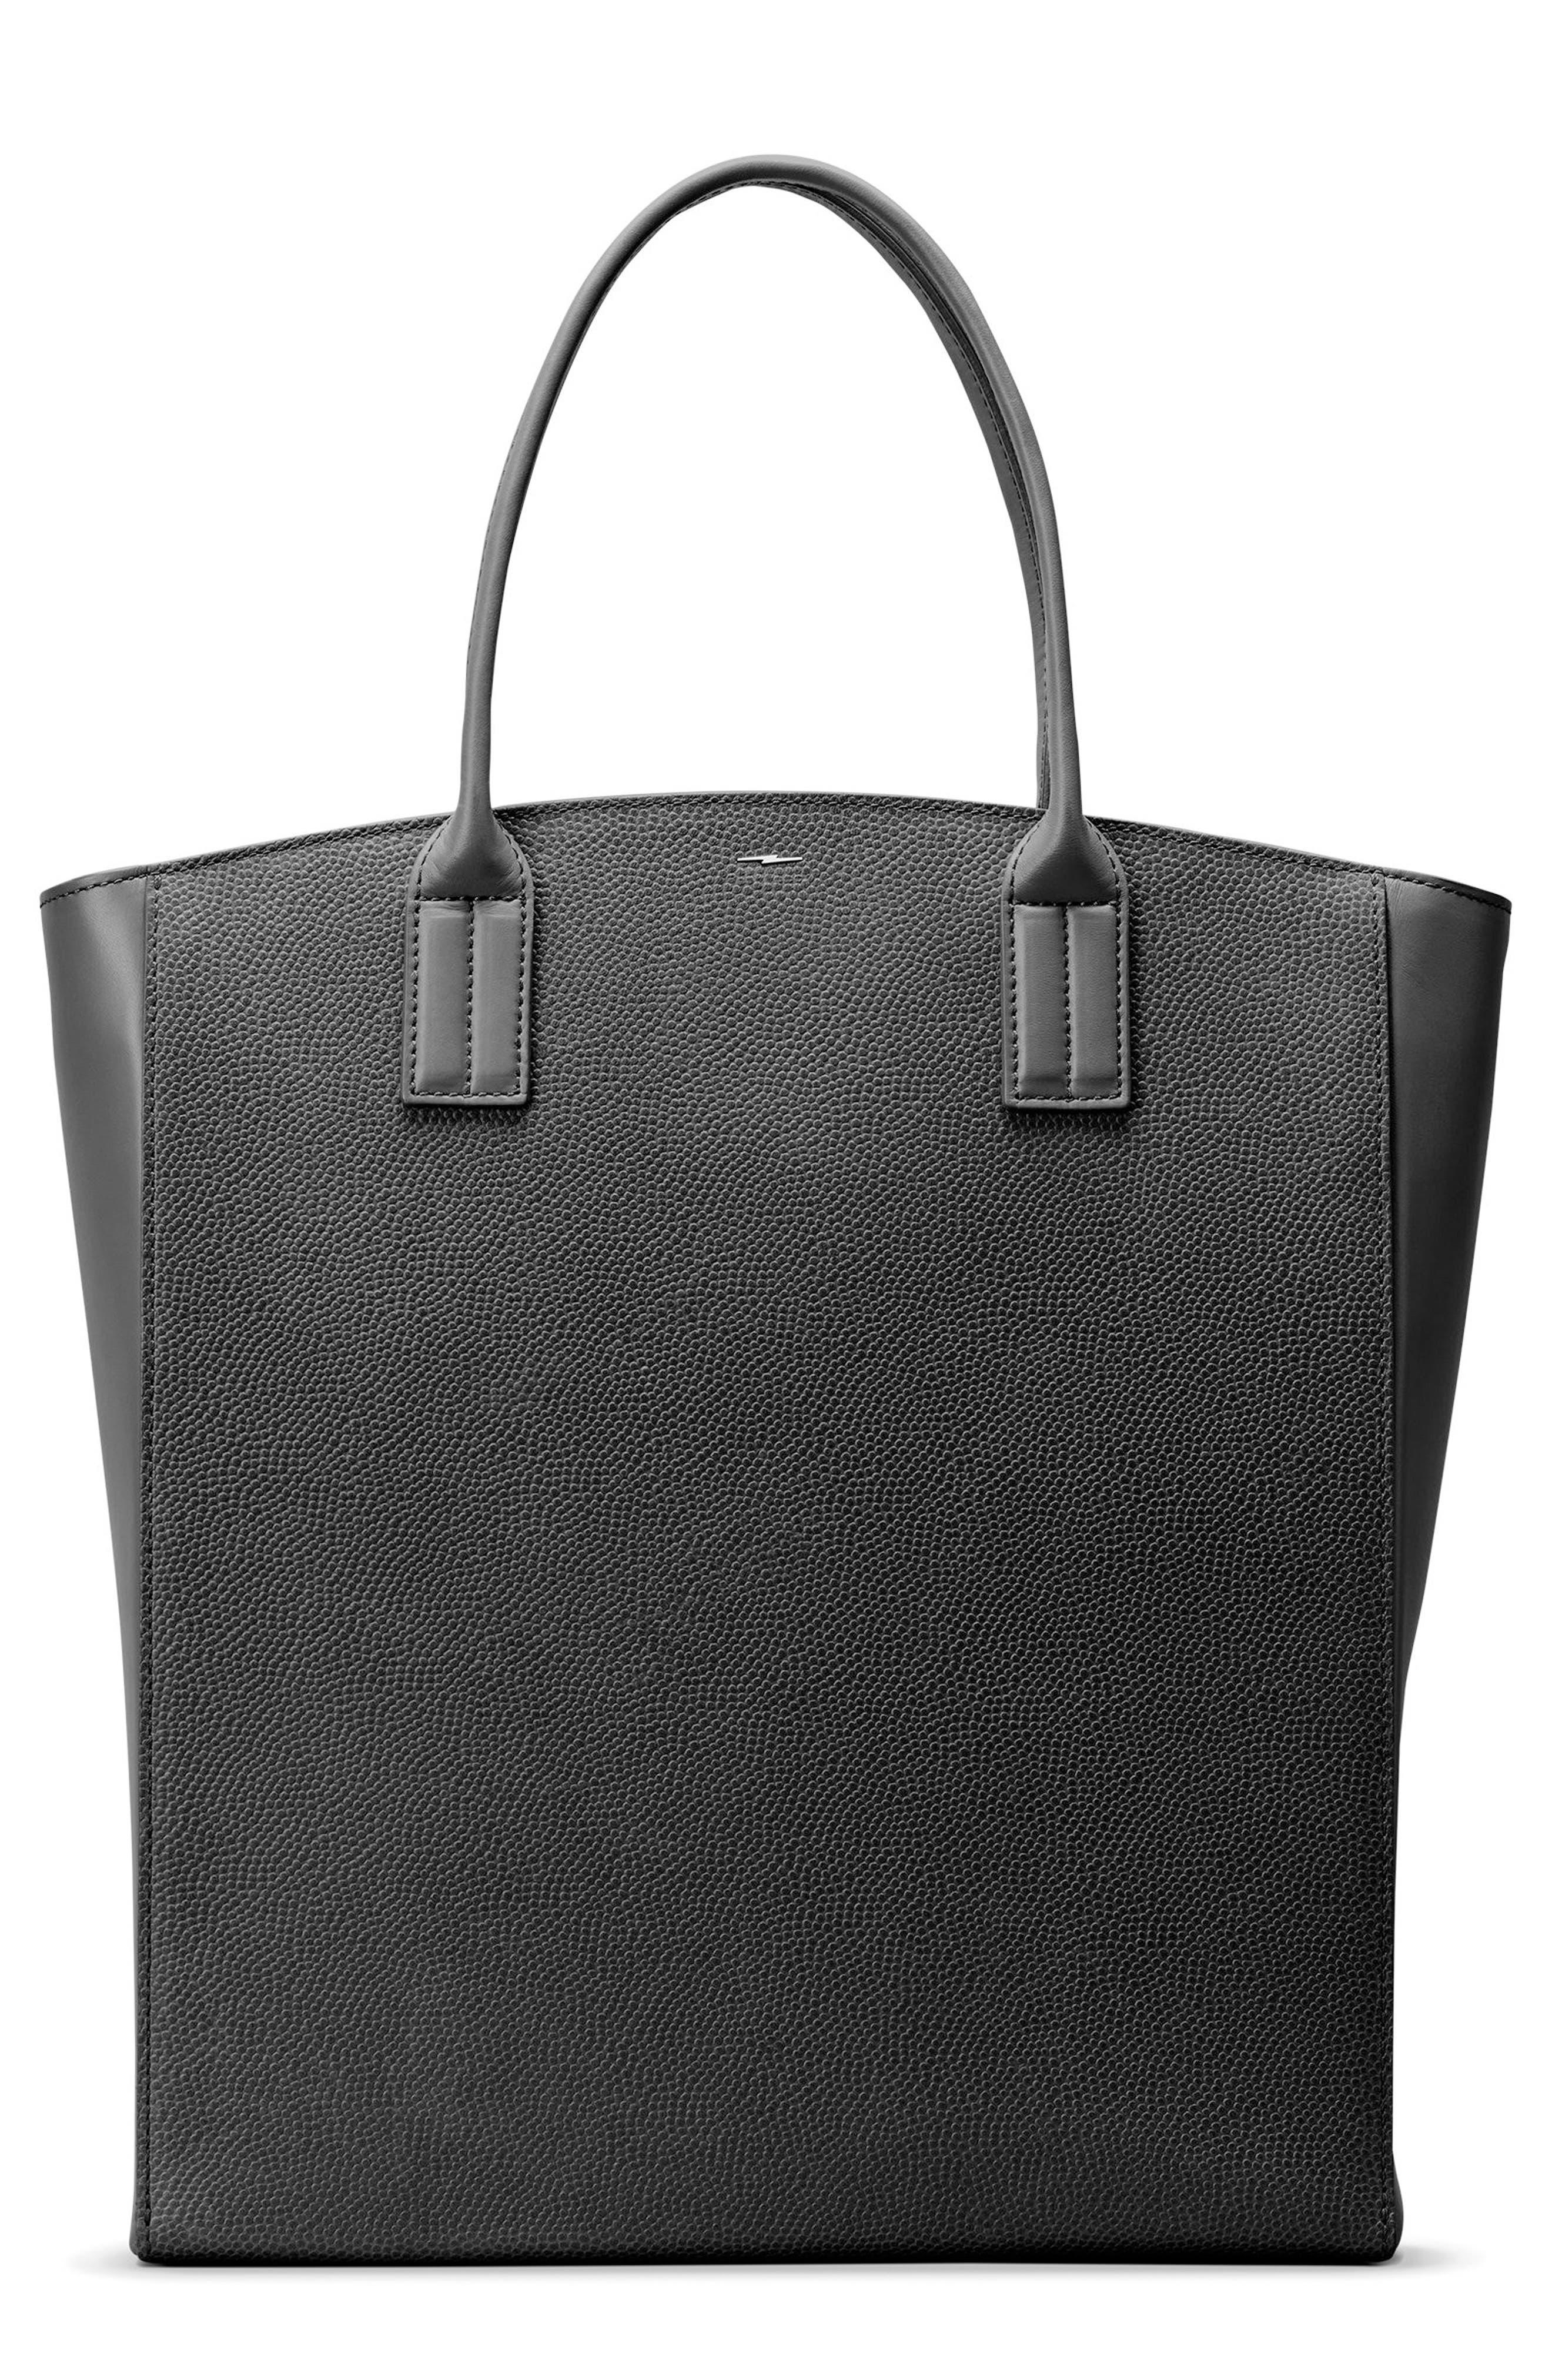 Shinola Latigo Leather Tote